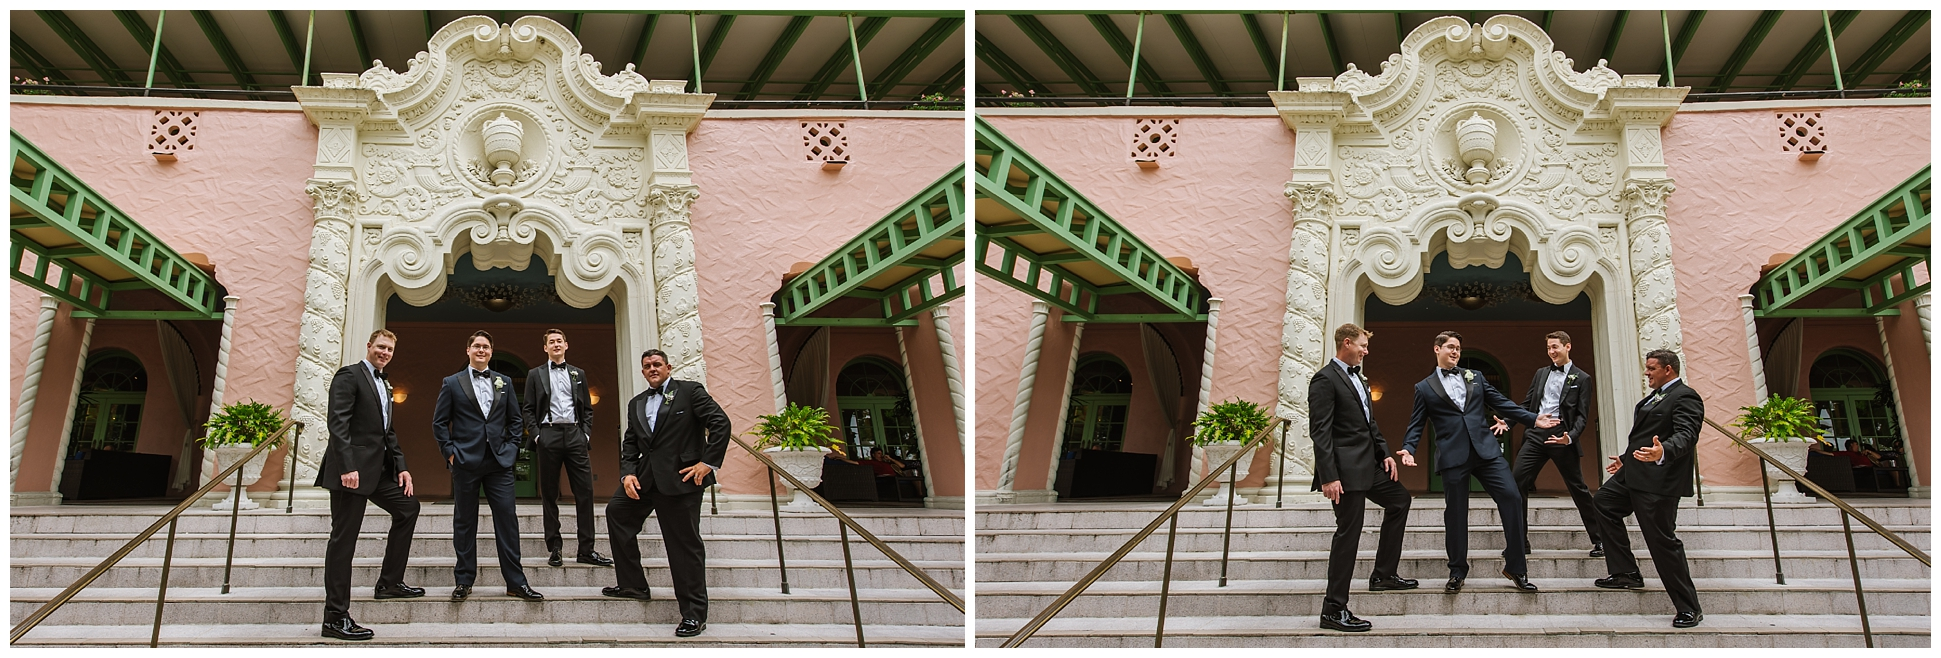 st-pete-wedding-photographer-italian-romance-theme-rustic-flower-crown_0361.jpg